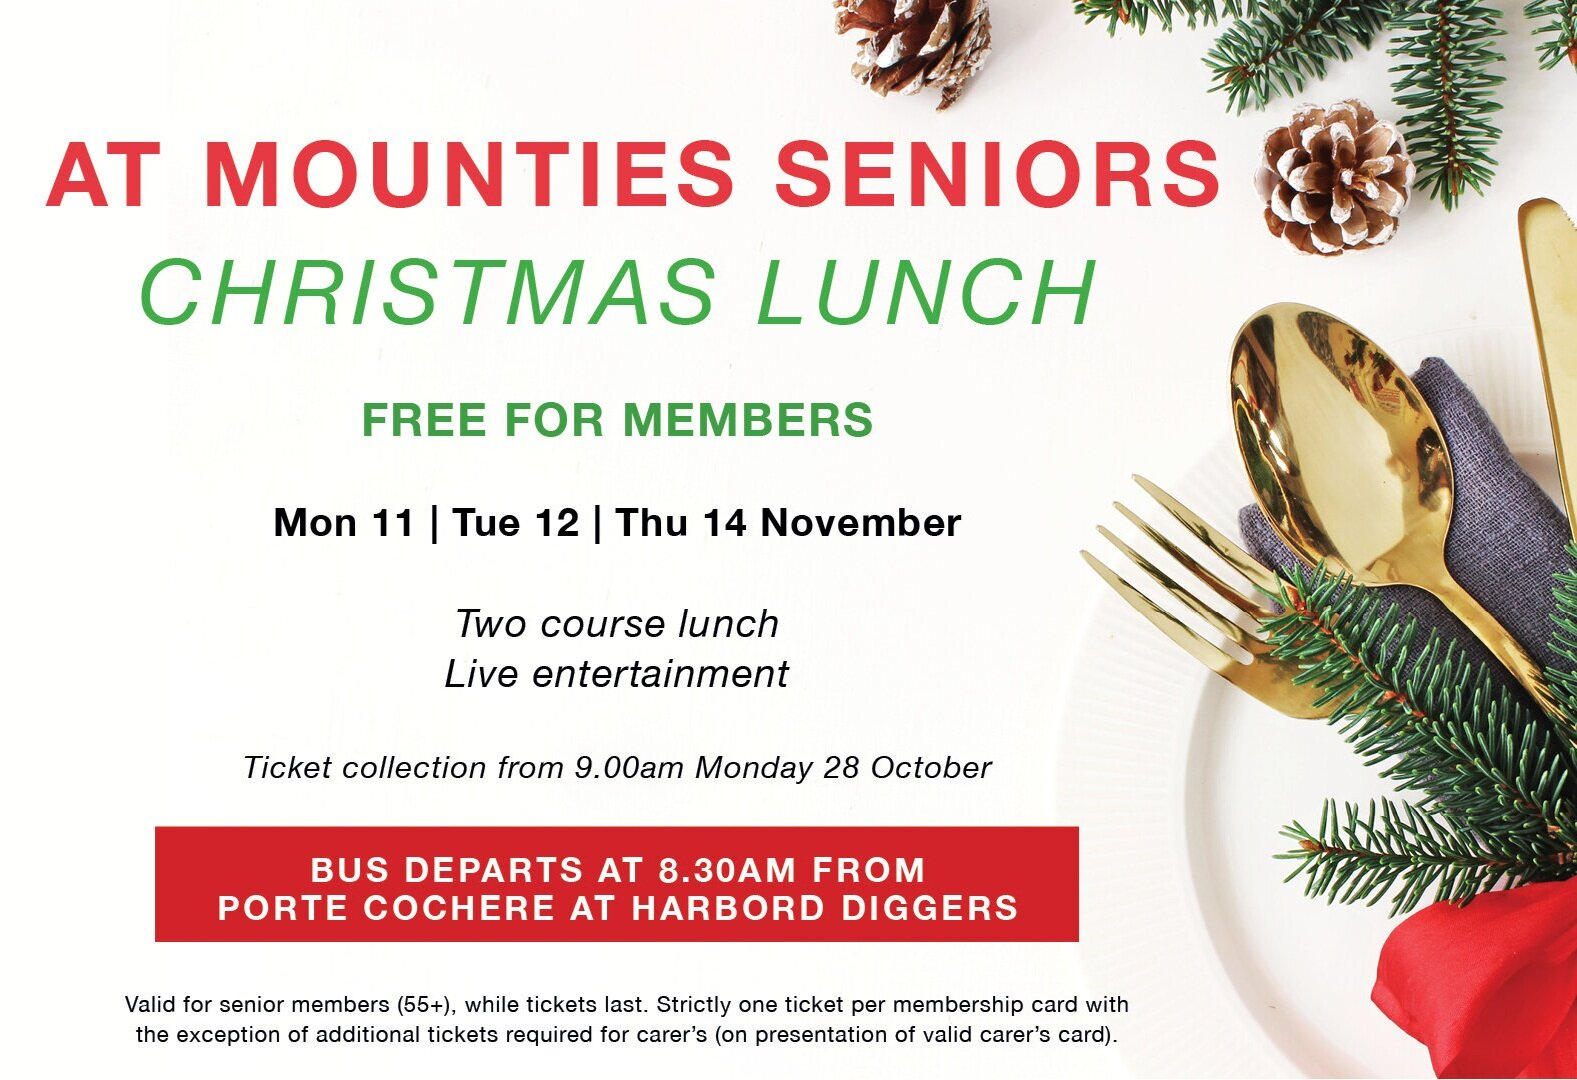 Mounties Seniors Christmas Lunch Covered Hub